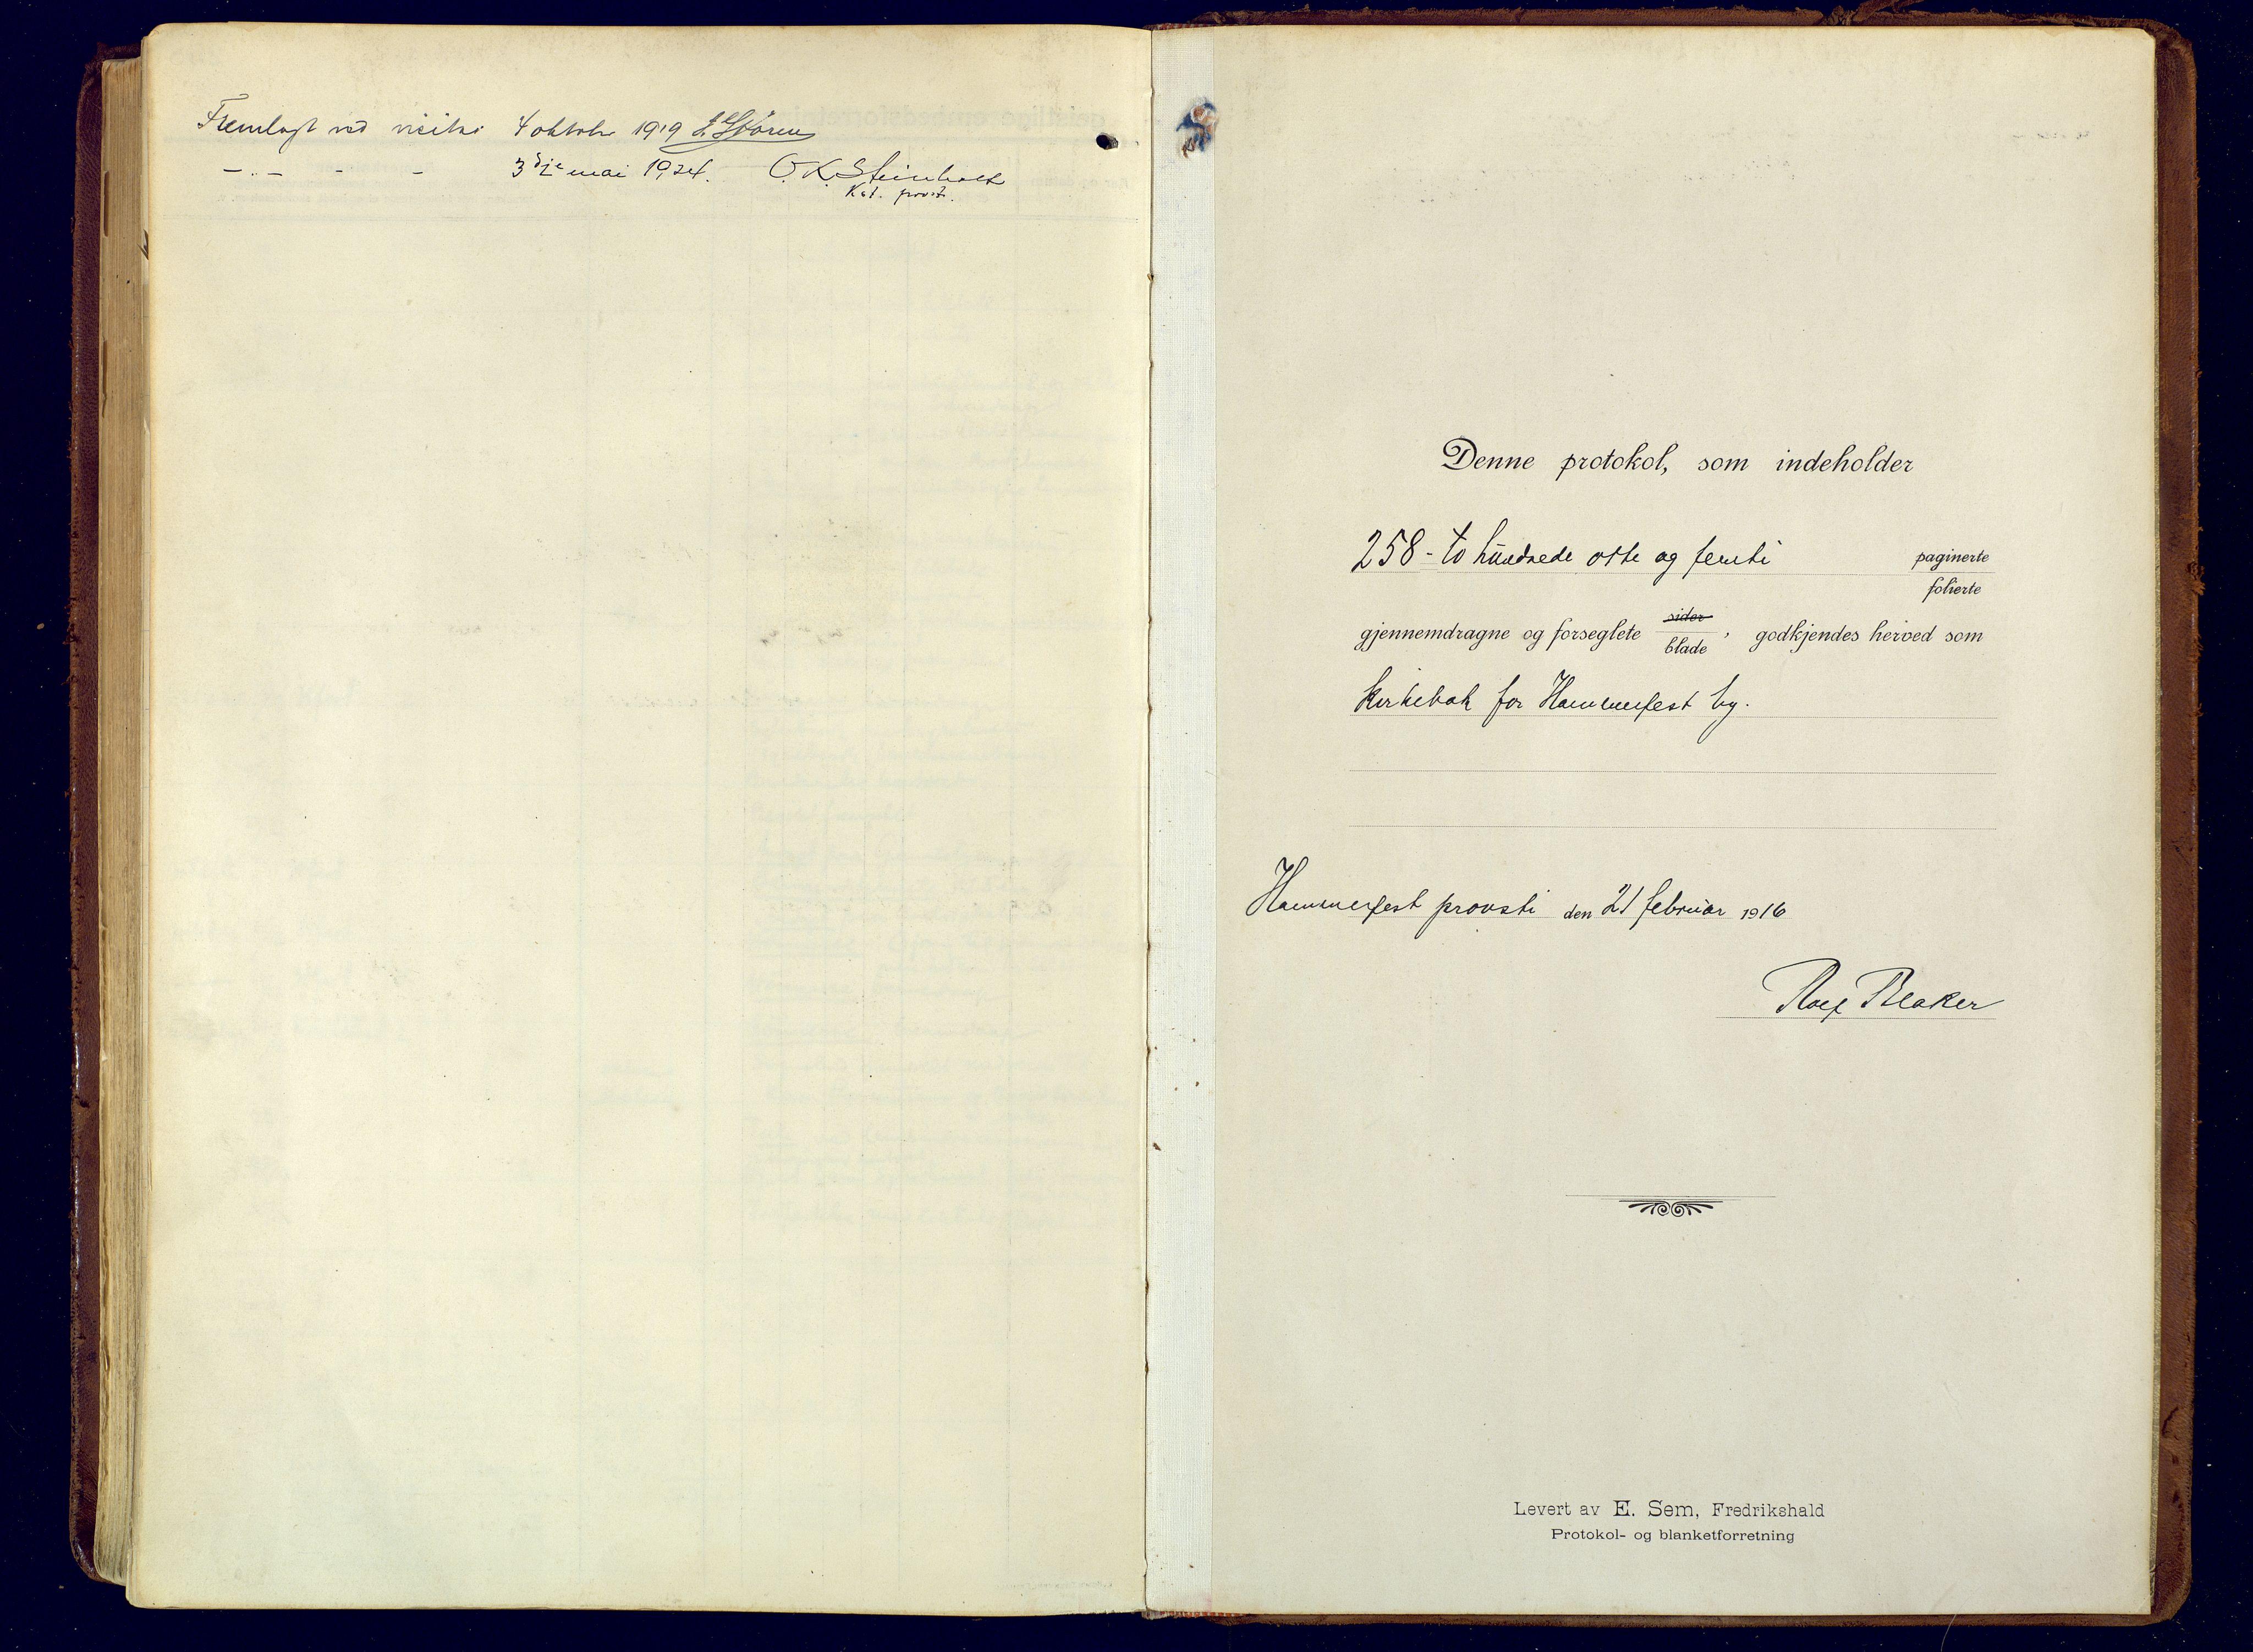 SATØ, Hammerfest sokneprestembete, Ministerialbok nr. 15, 1916-1923